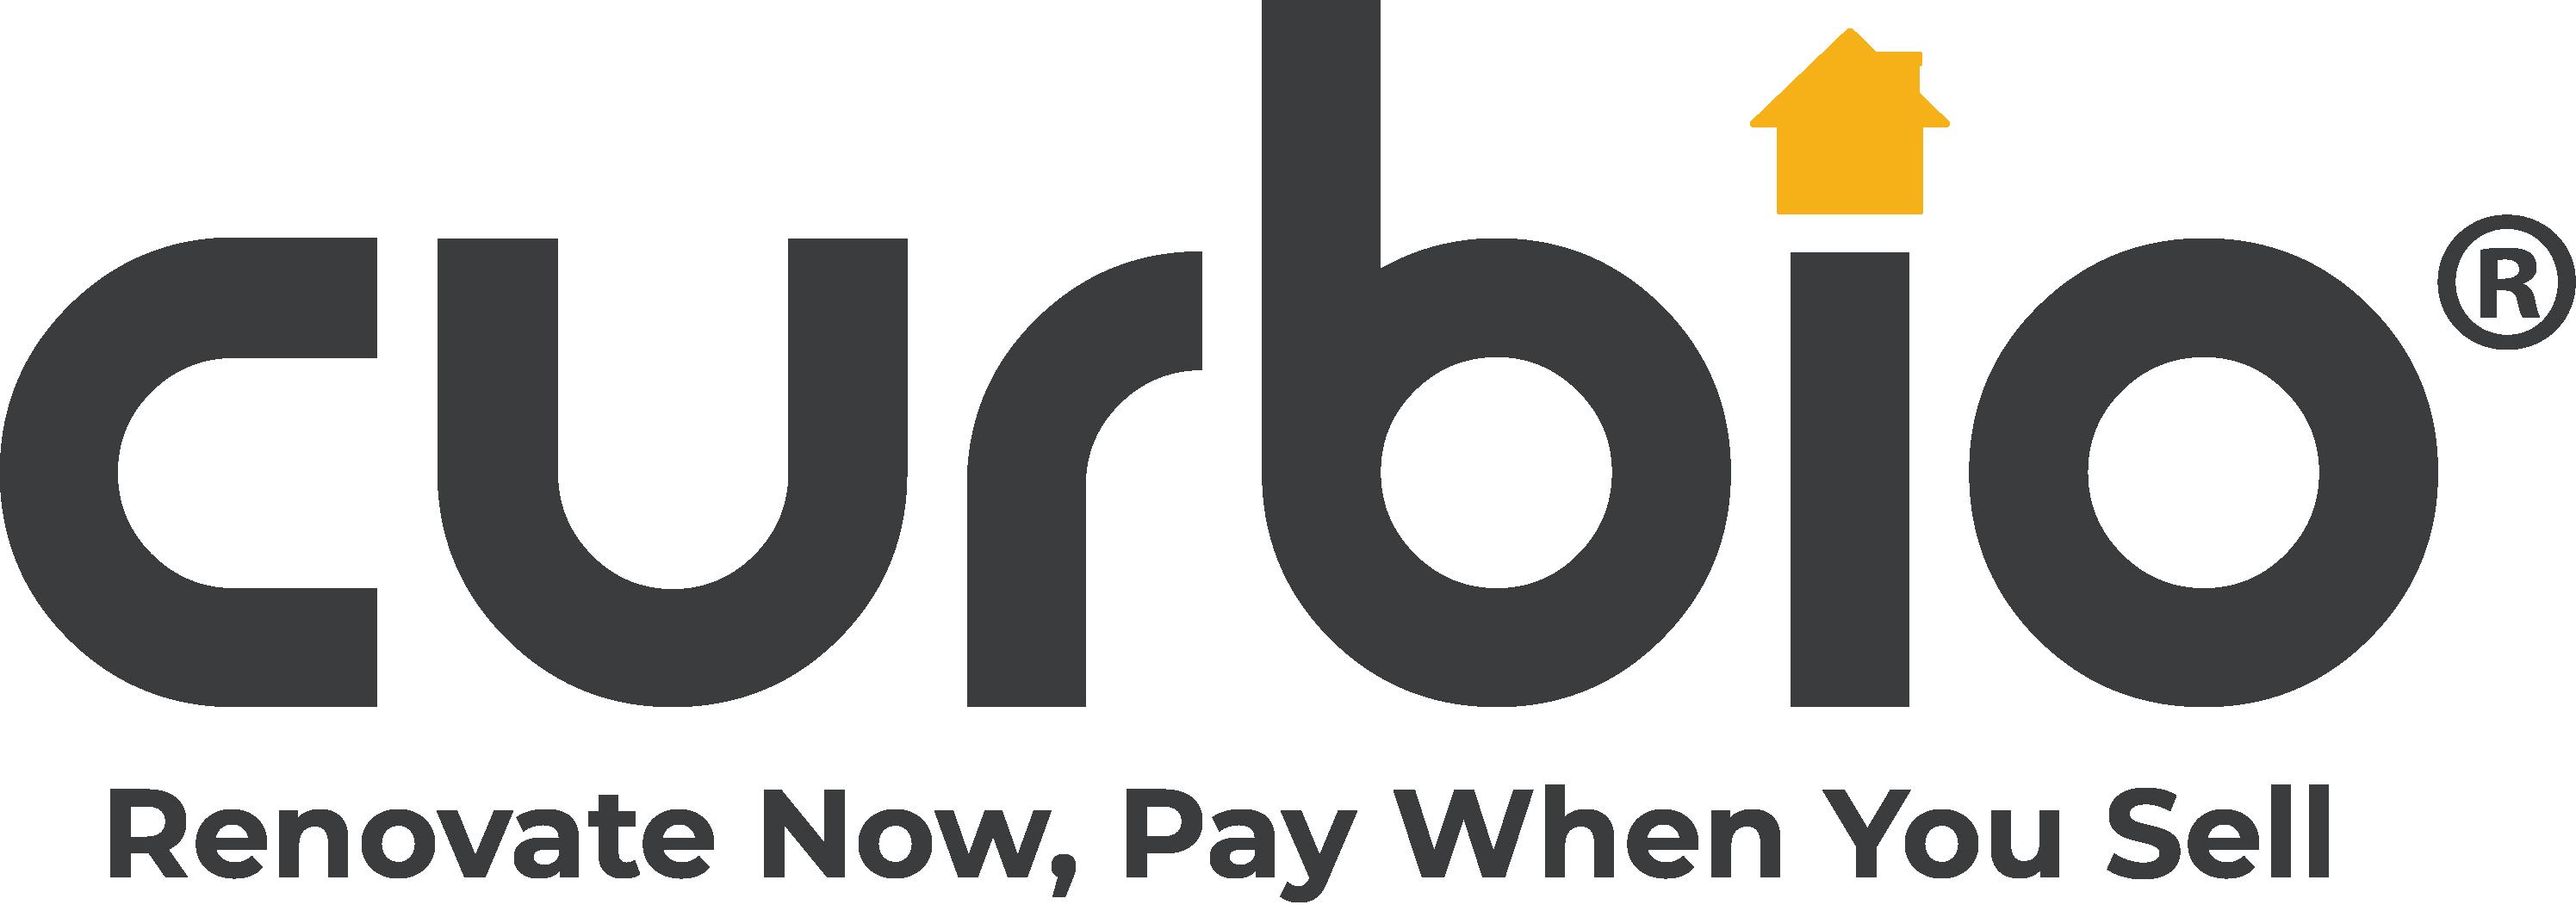 Welcome Gift Sponsor - Curbio - Logo